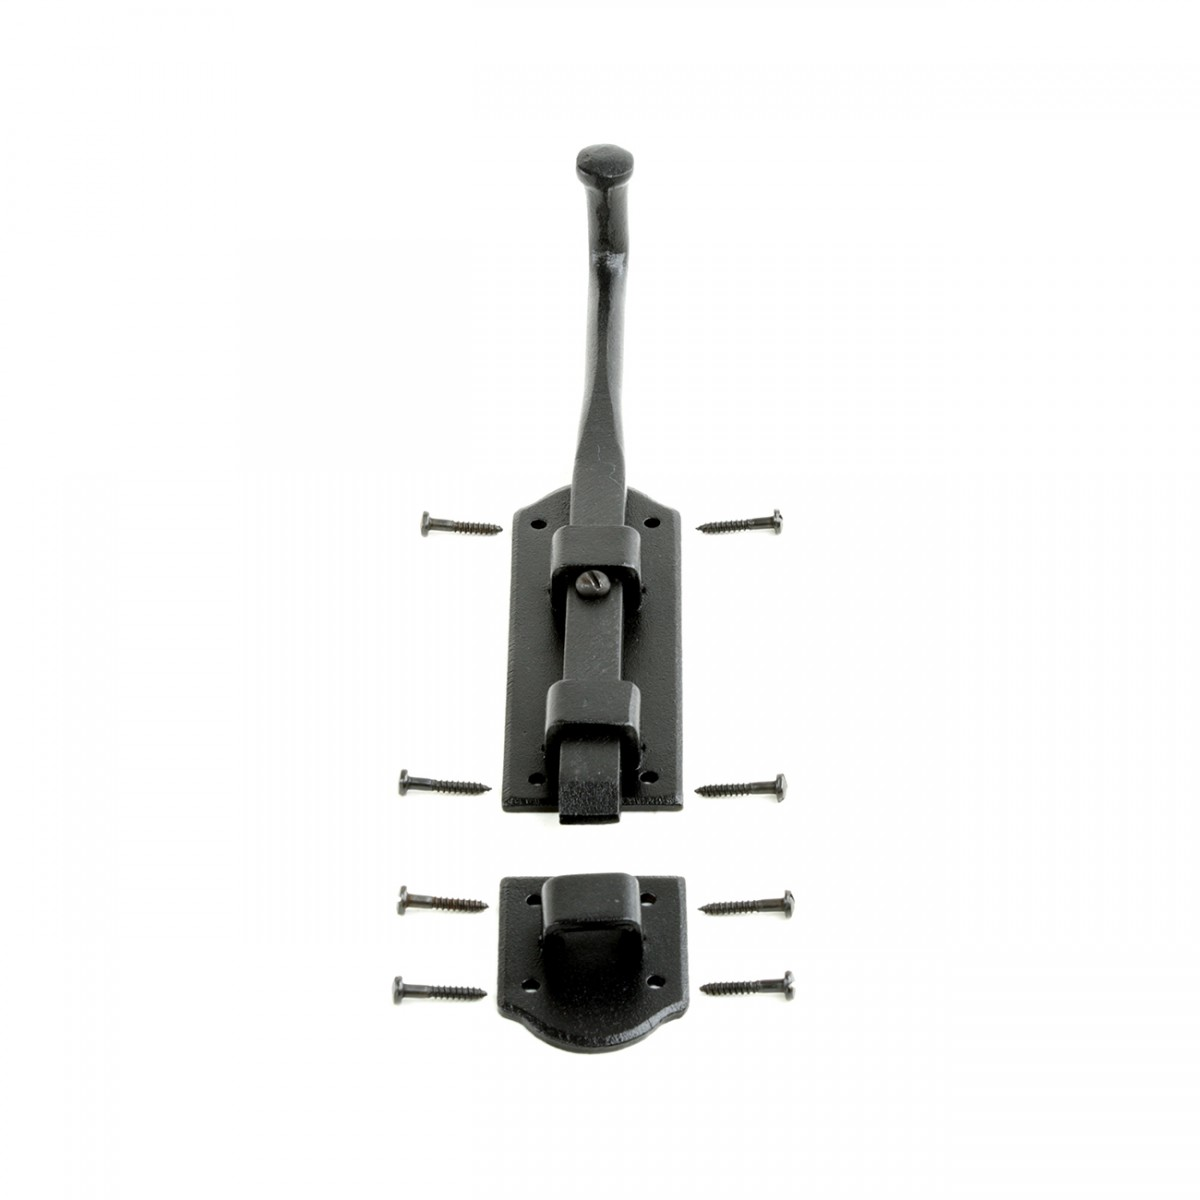 Black Wrought Iron Tower Door Slide Bolt 9 W Black Slide Bolt Slide Lock For Door Wrought Iron Slide Latch Lock